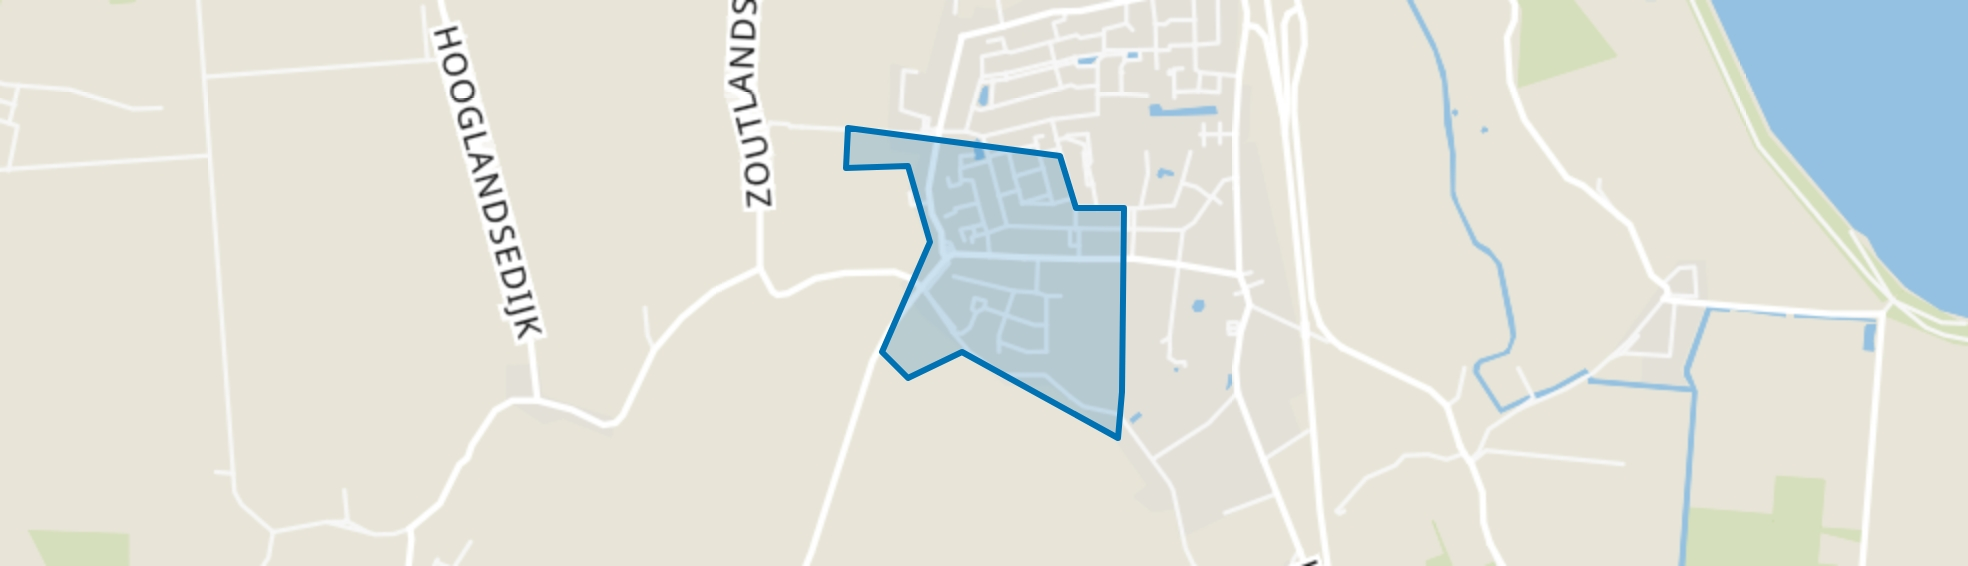 Zandewijk, Kloosterzande map